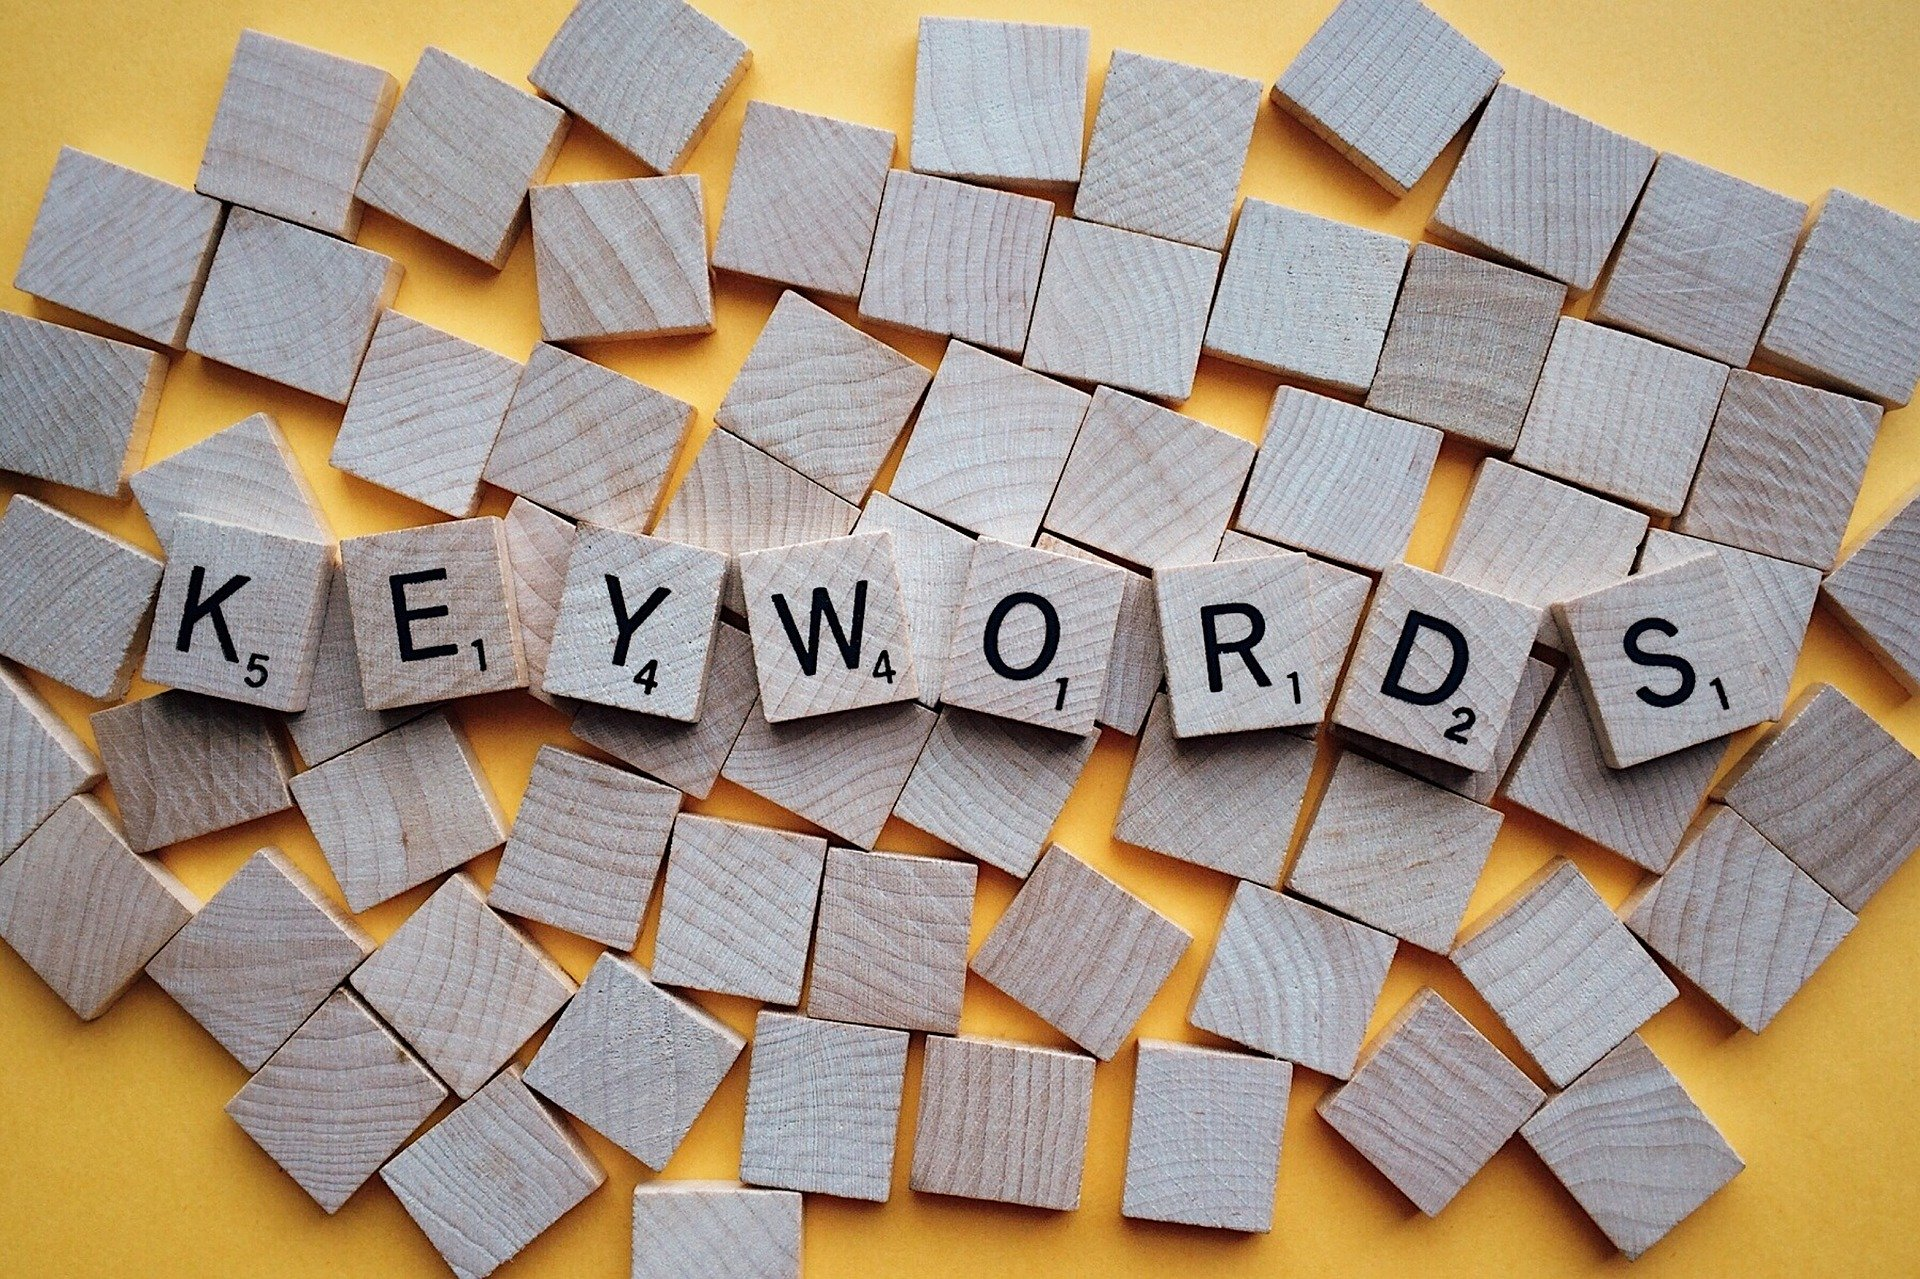 keywords cover image